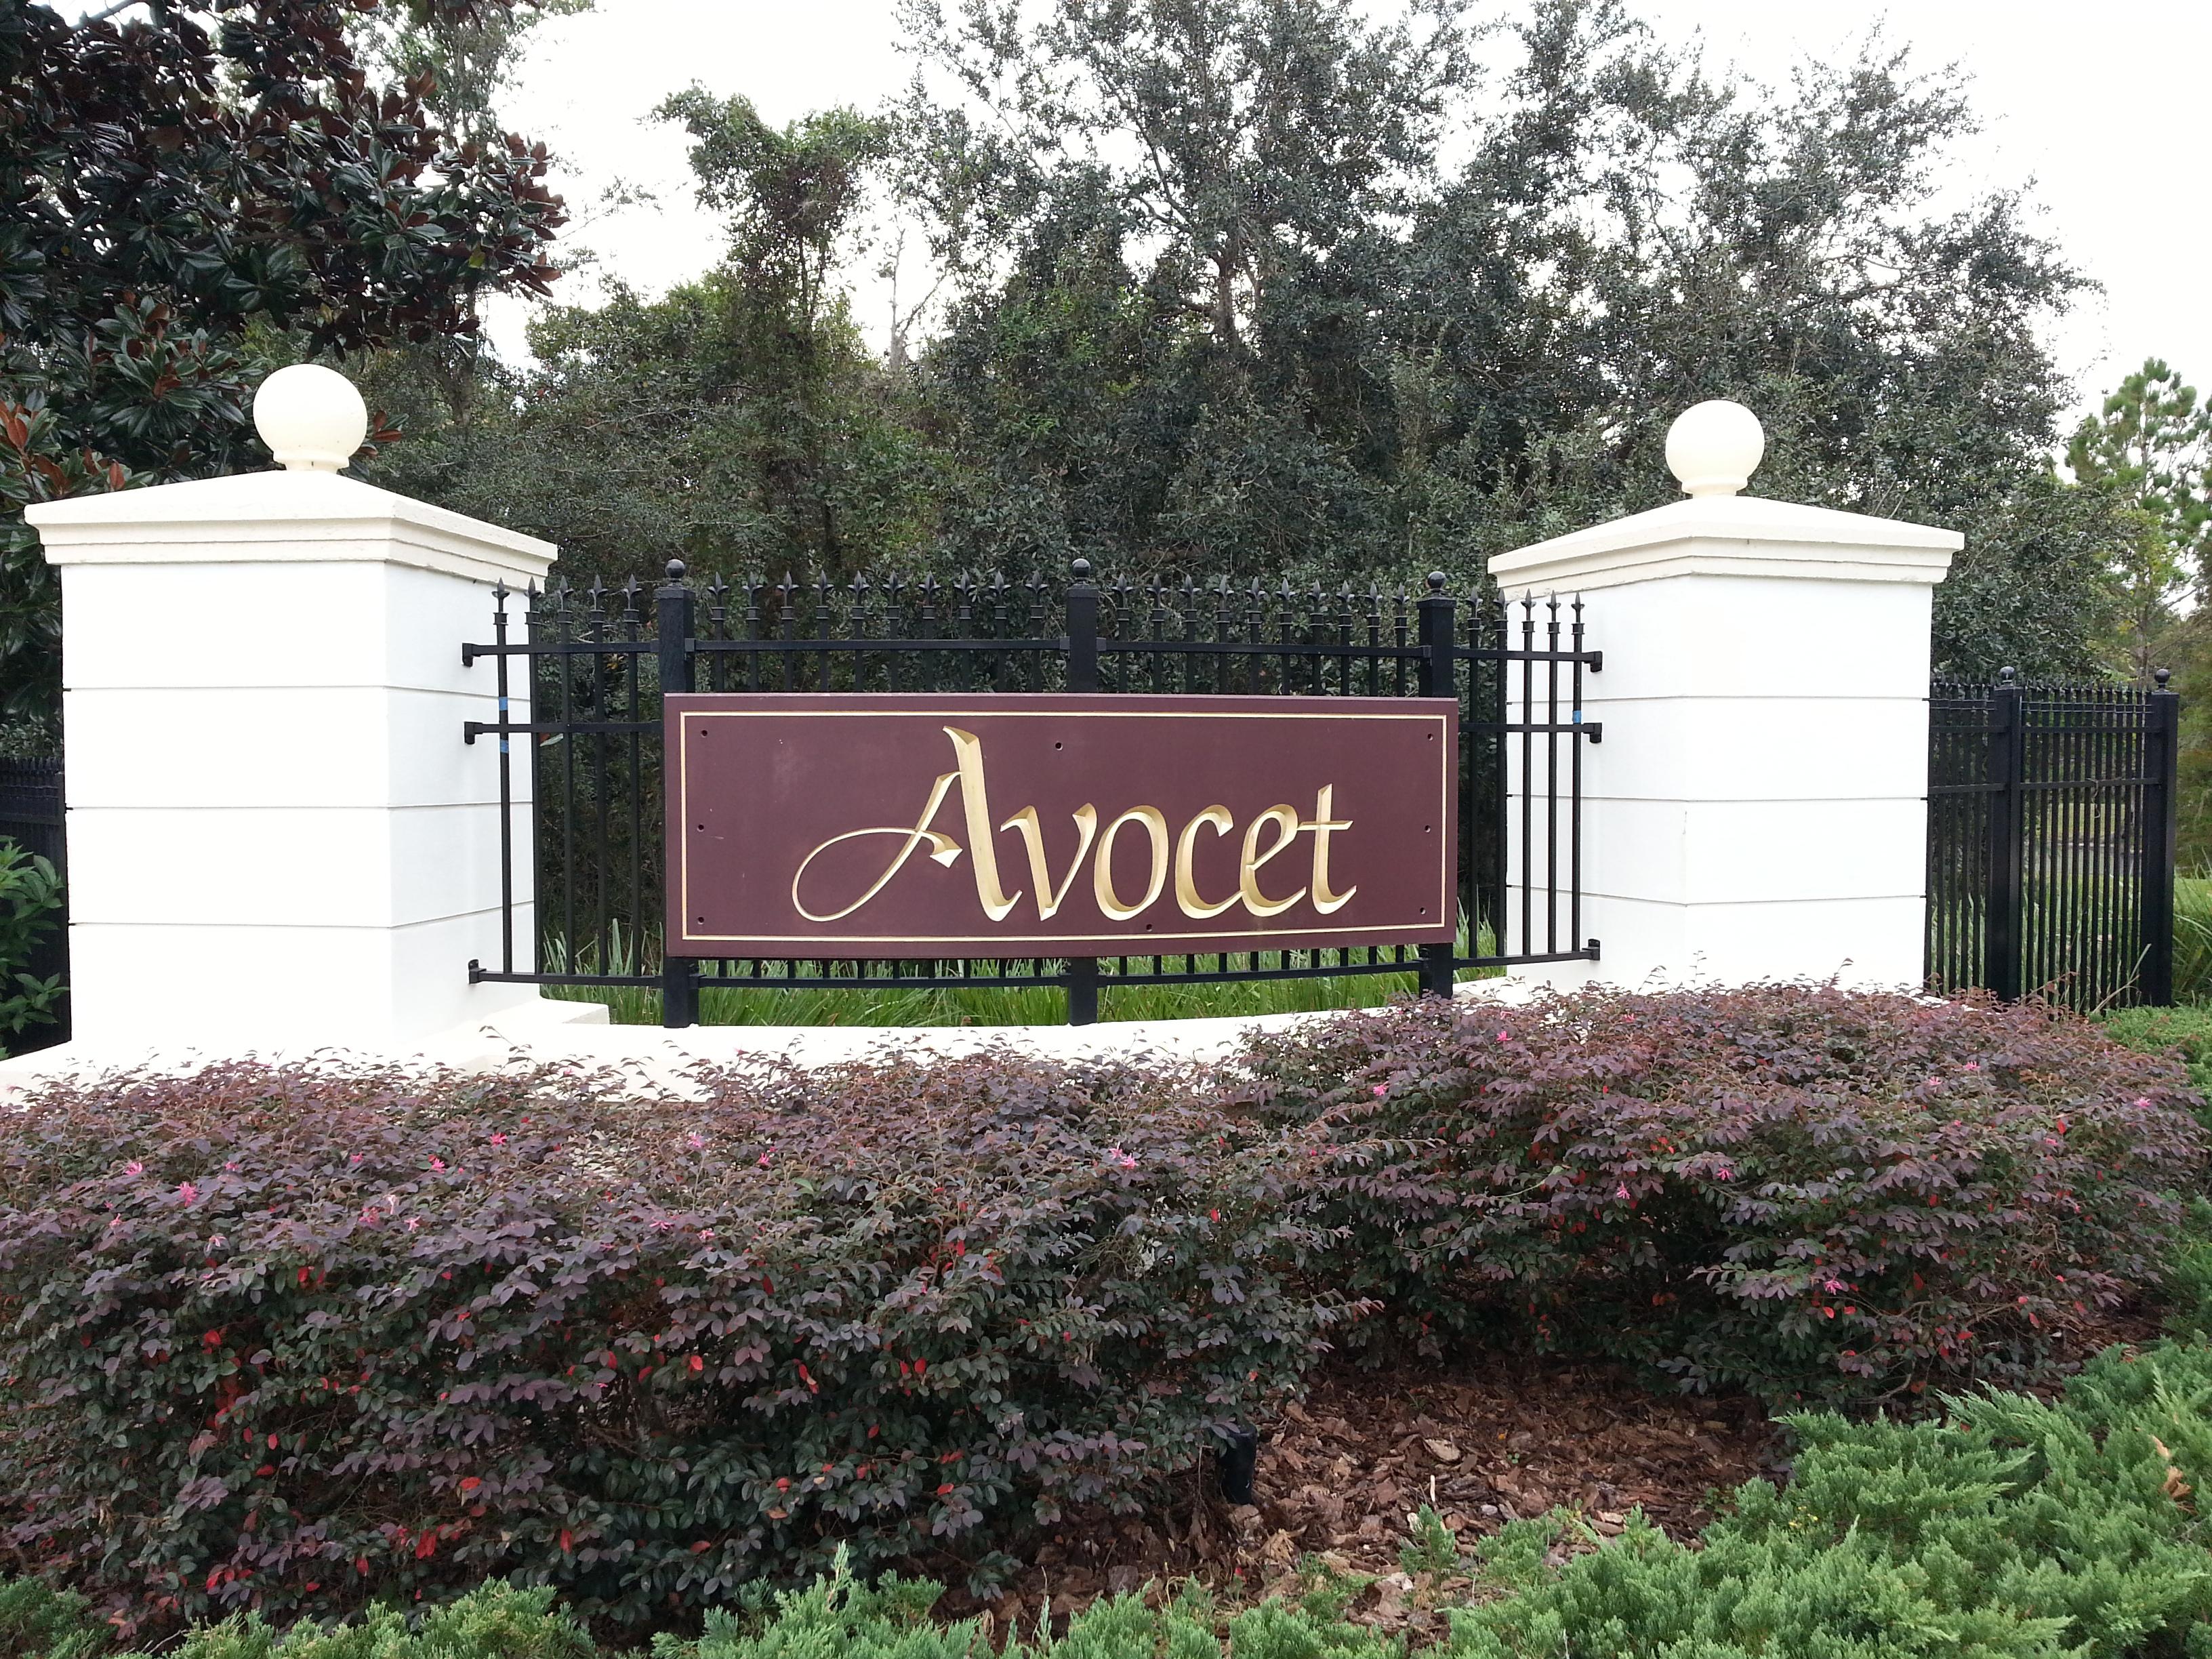 Avocet for Fish real estate